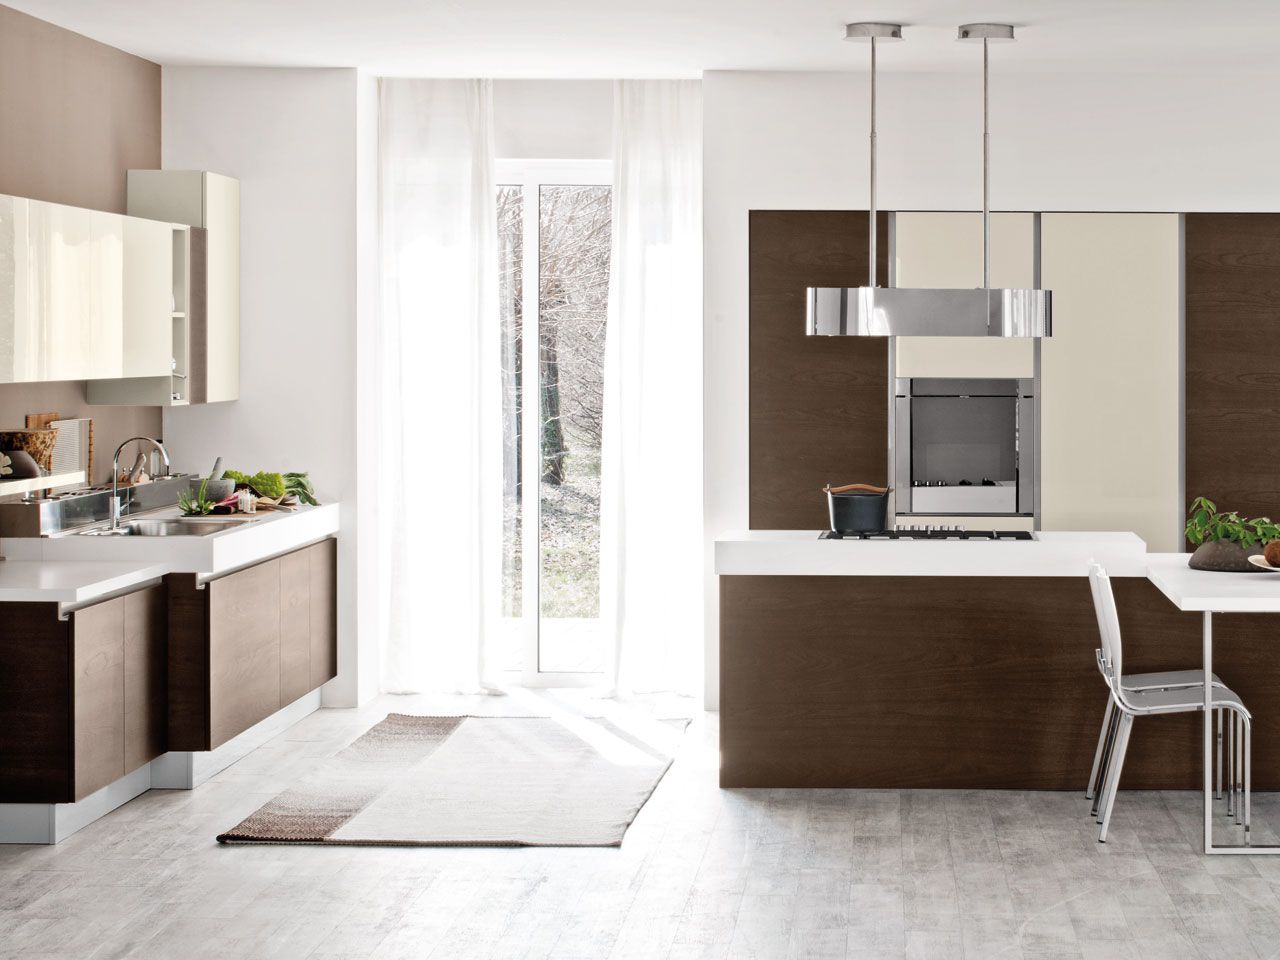 BRAVA - Cucina Lube Moderna | Ripiani in marmo, Cucine ...